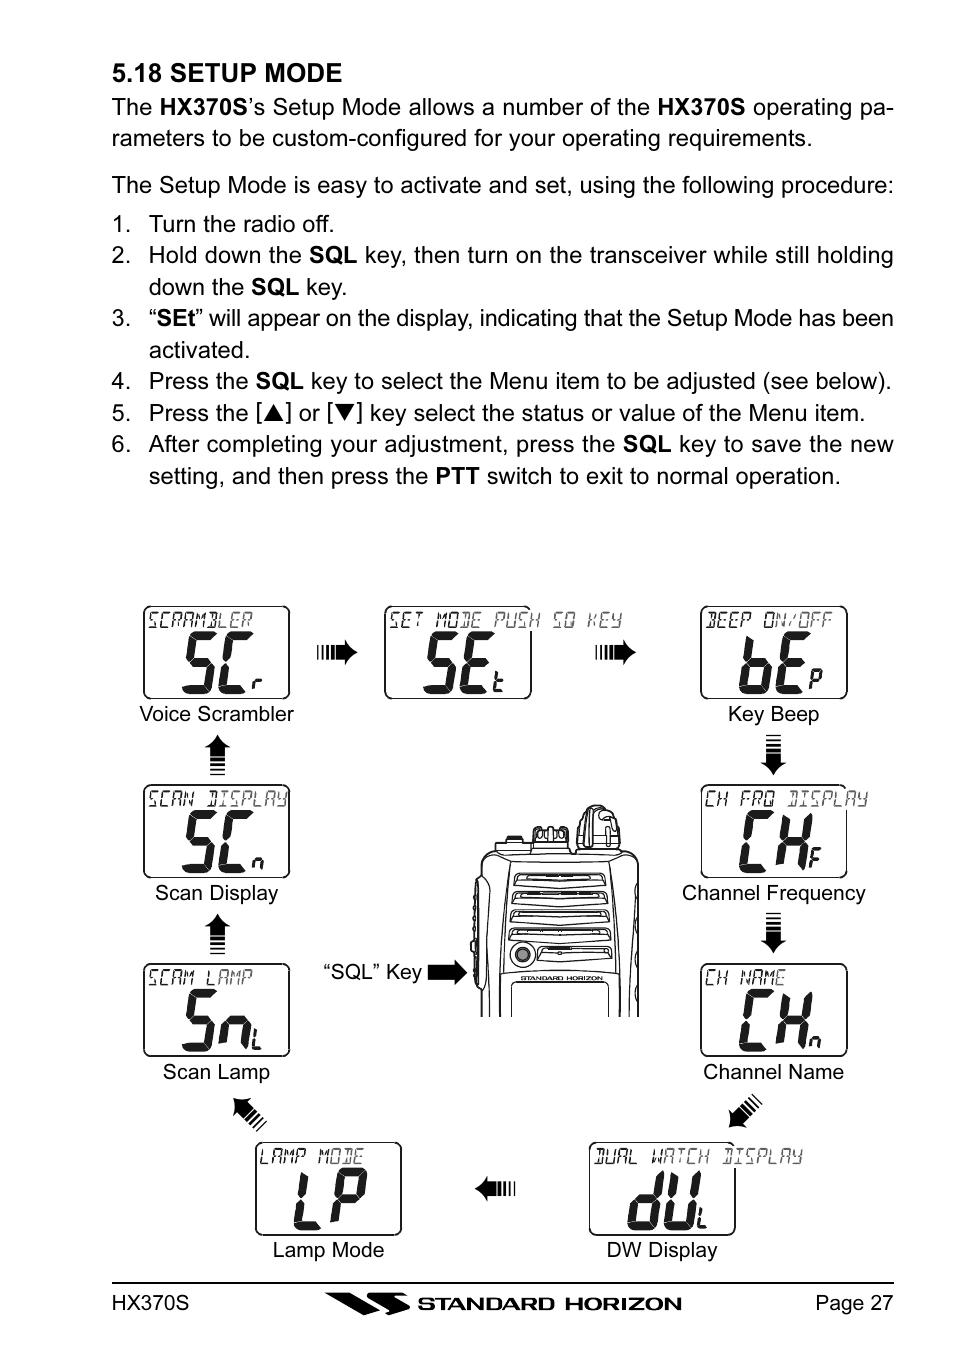 standard horizon hx370s user manual page 29 48 rh manualsdir com standard horizon hx370e manual Standard Horizon HX370S Radio